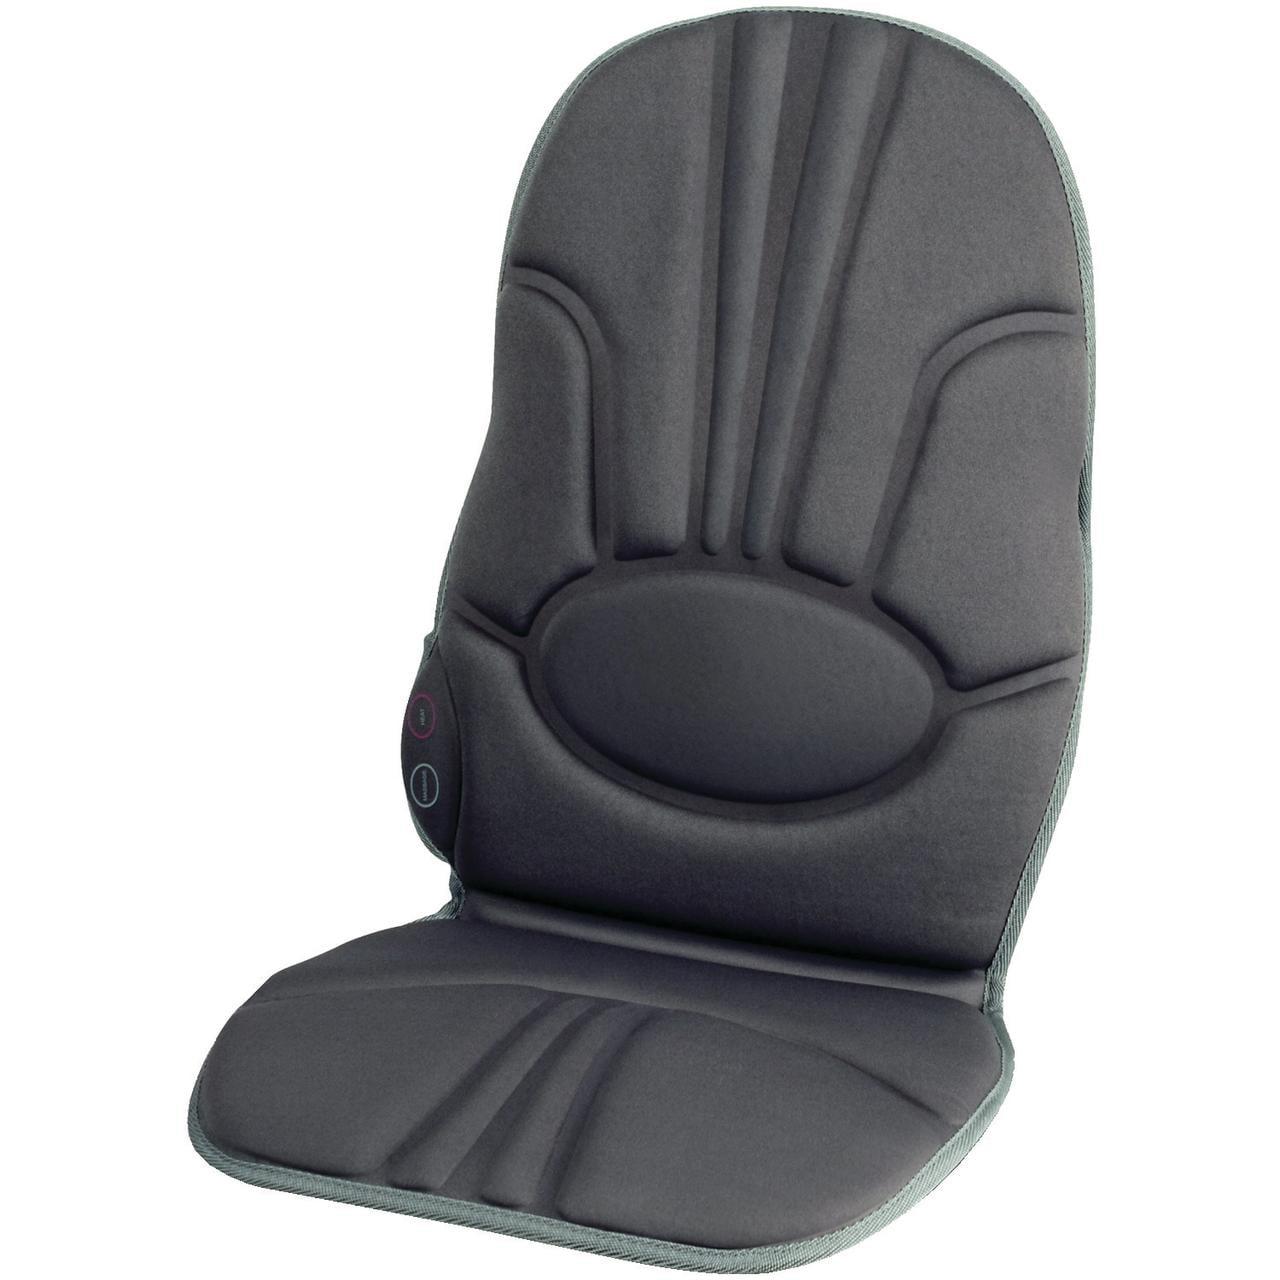 Homedics VC110 Comfort Deluxe Massage Cushion With Heat Walmartcom